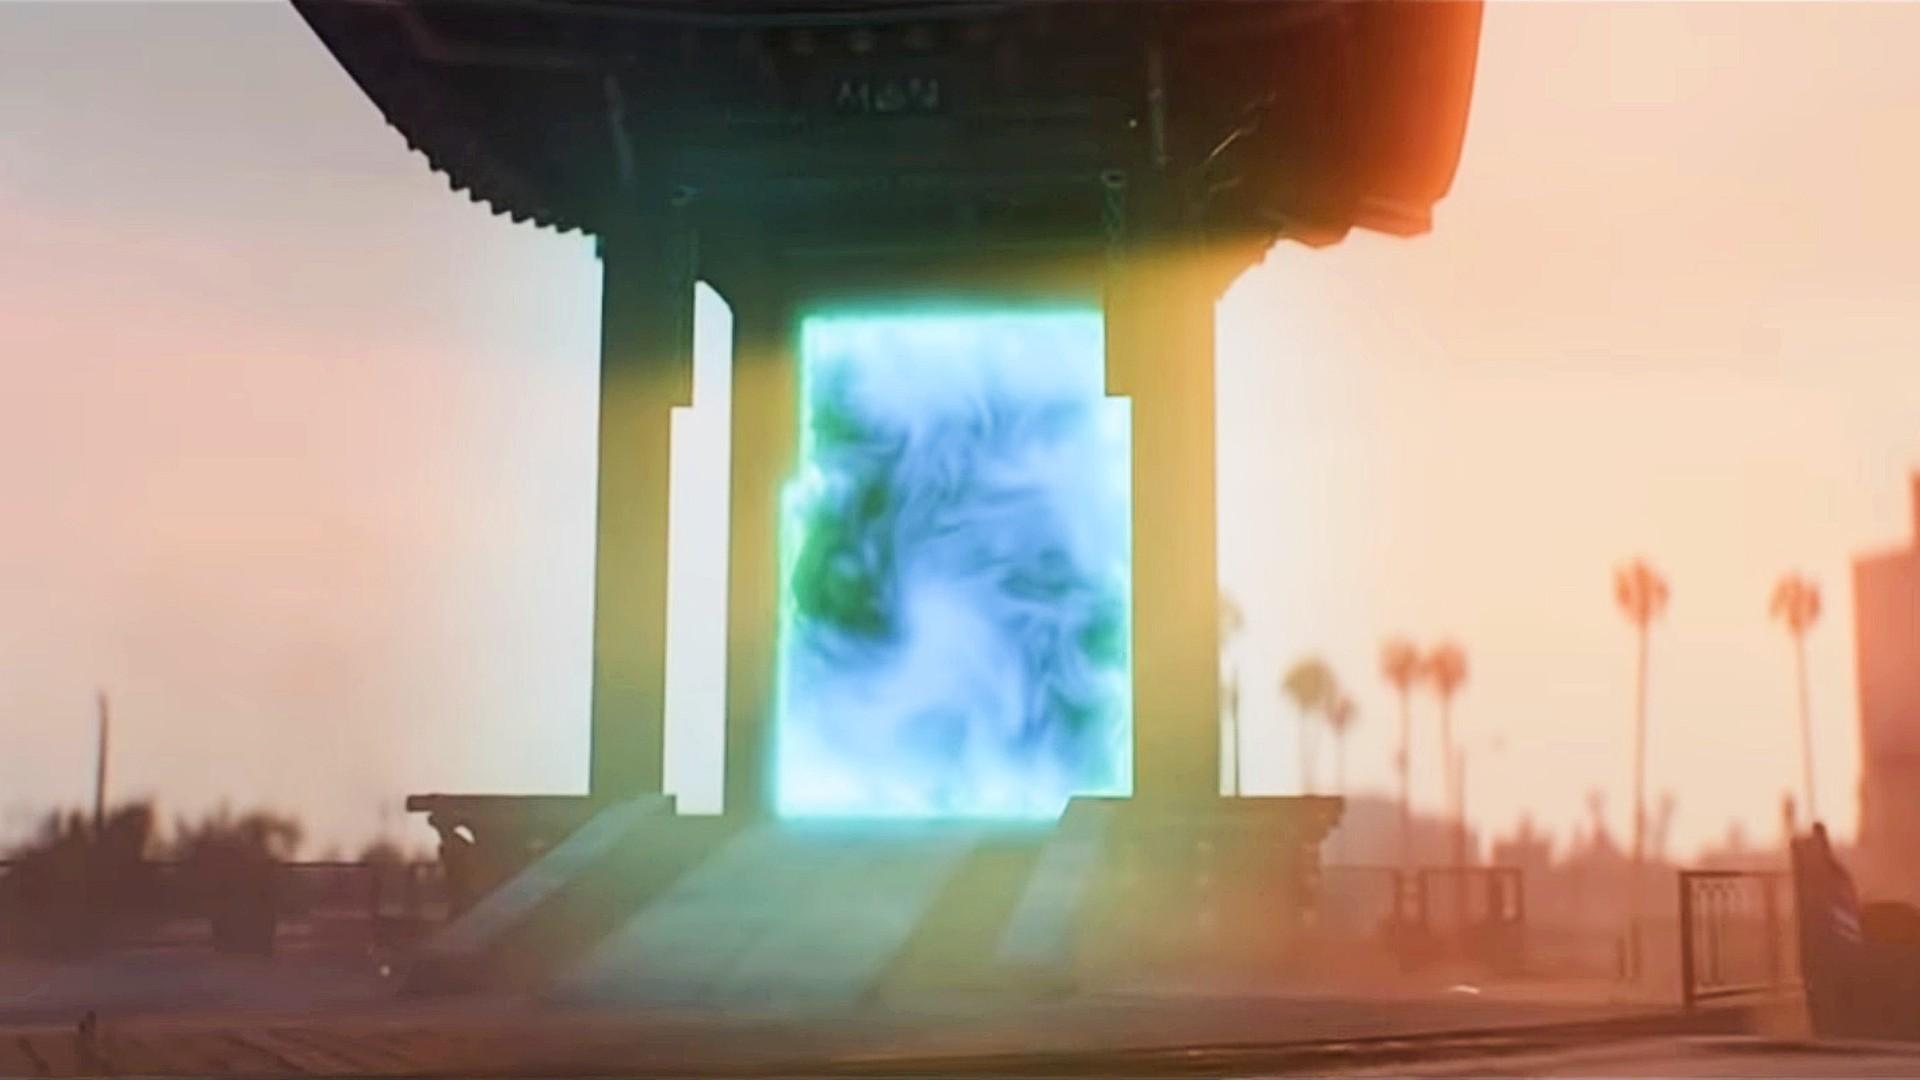 GTA roleplayers are recreating WoW's Burning Crusade raid